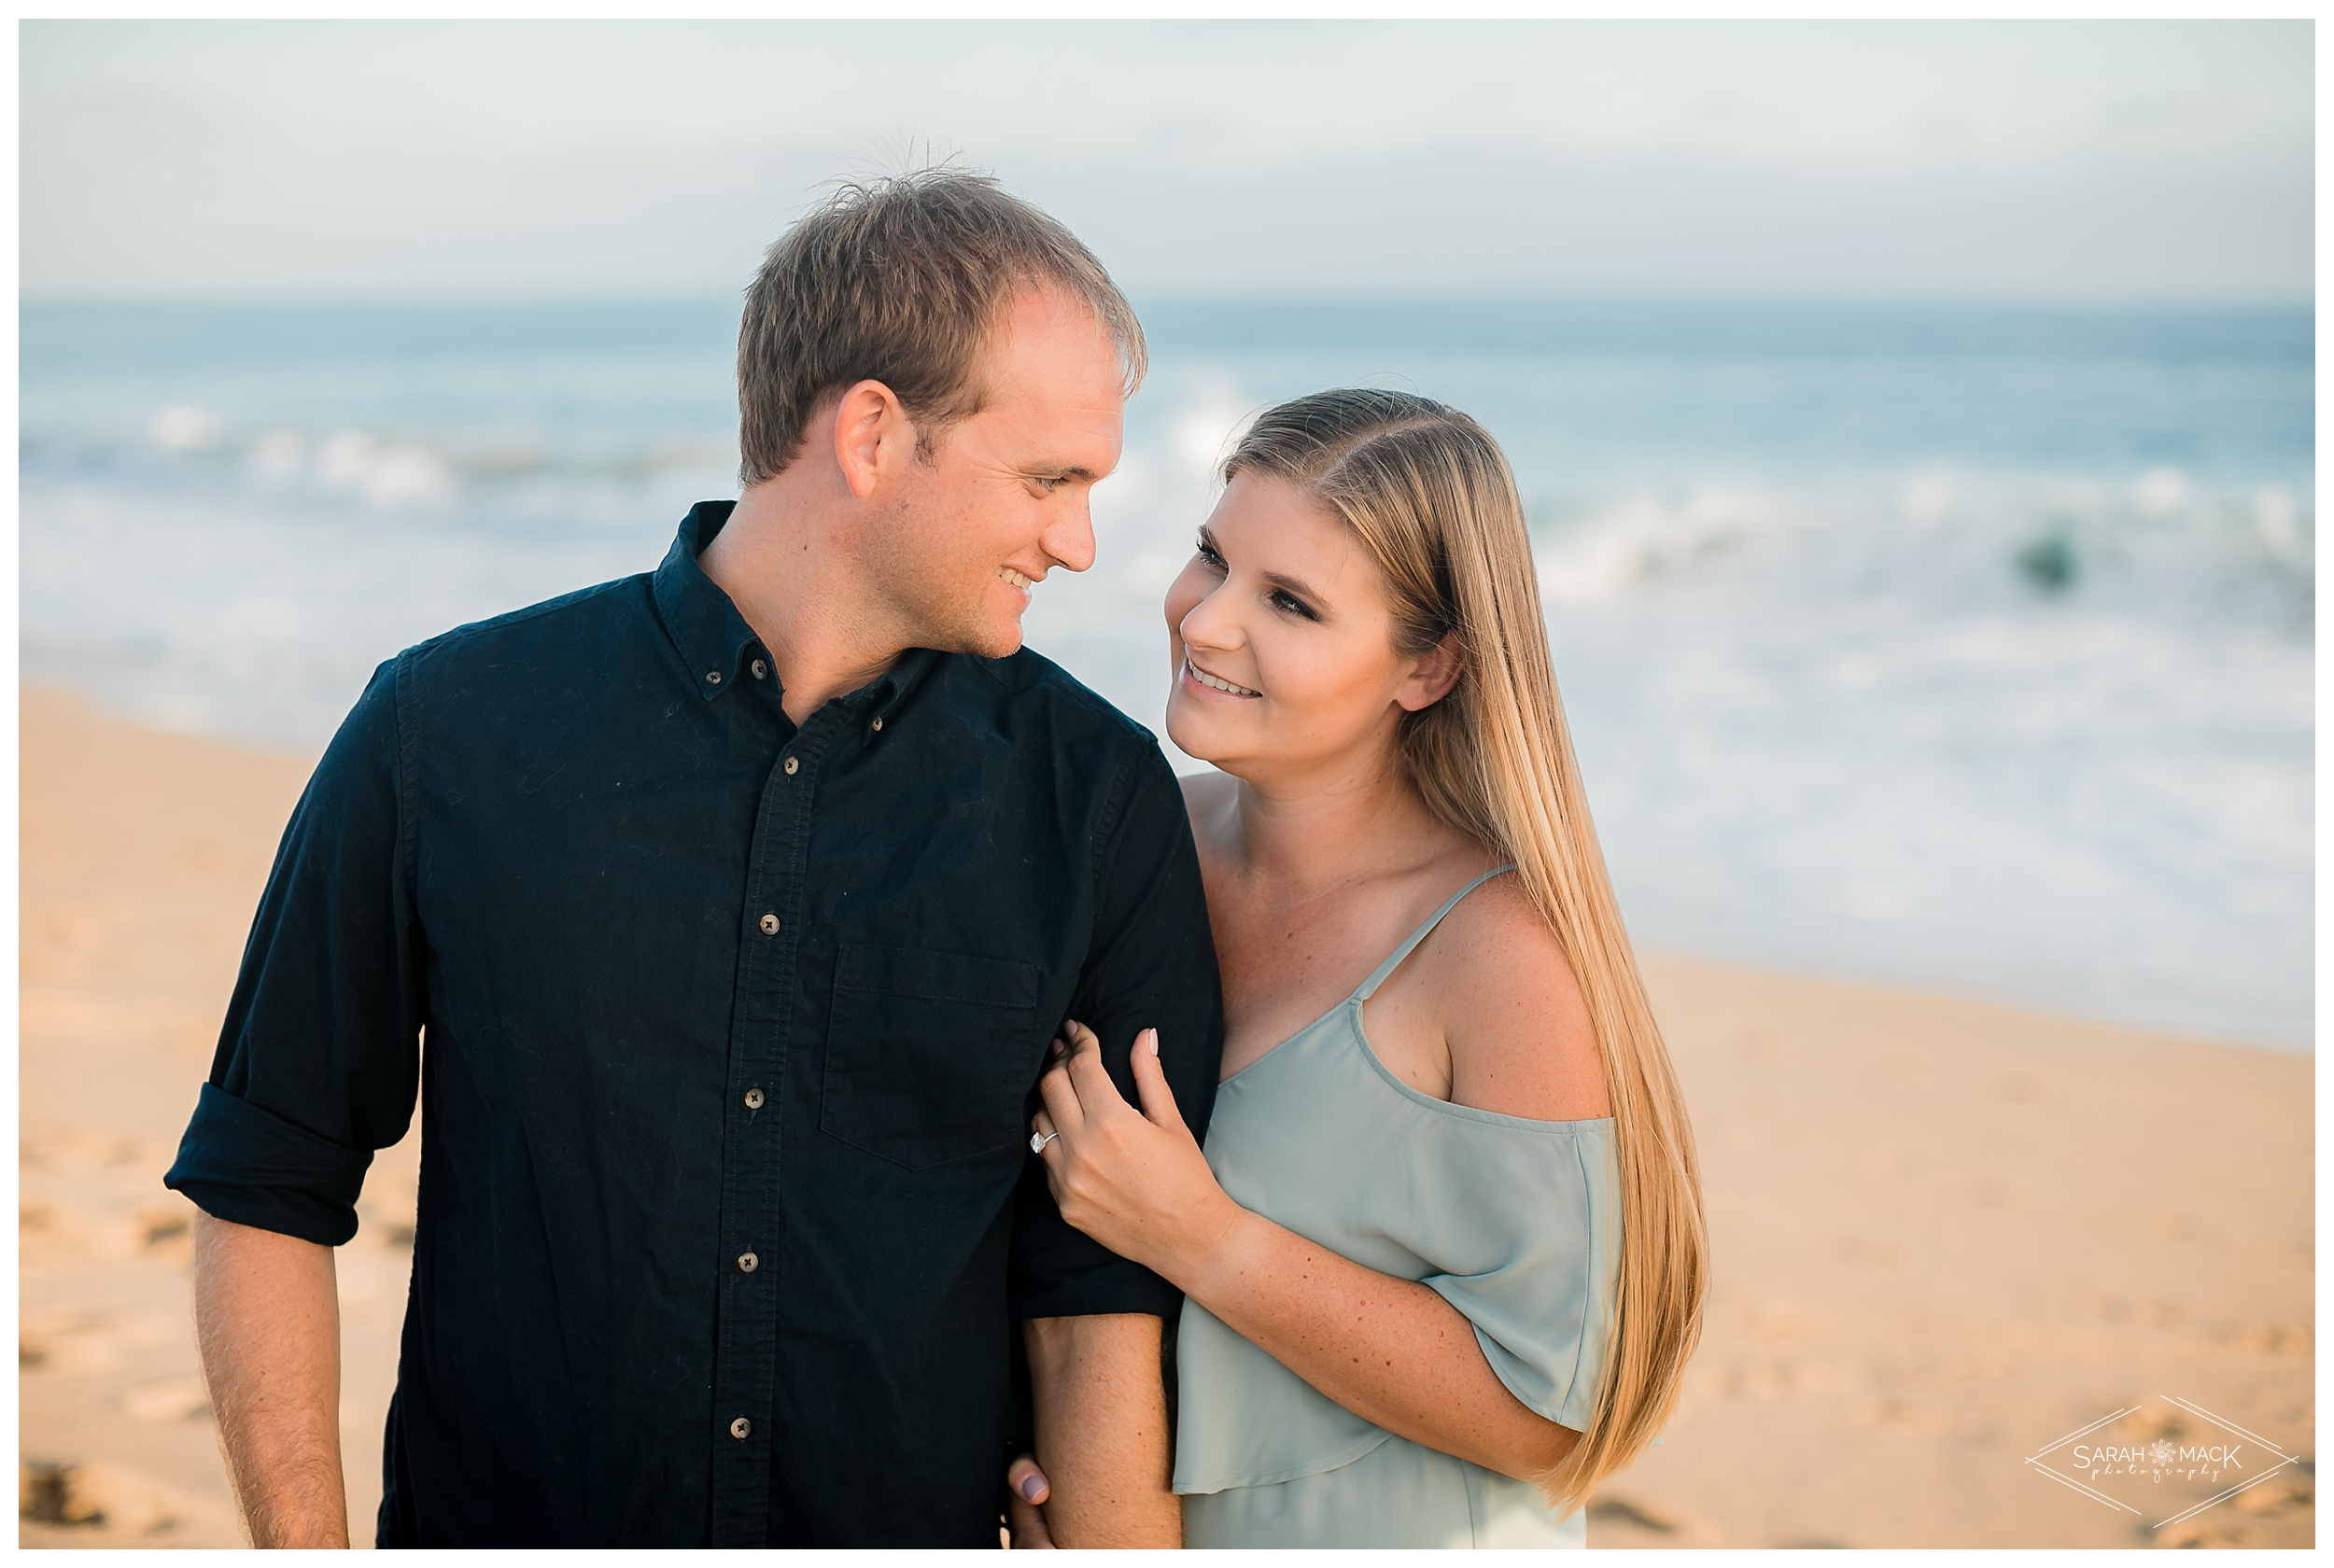 HI_Balboa_Island_Newport-Beach-Engagement-Photography-025.jpg